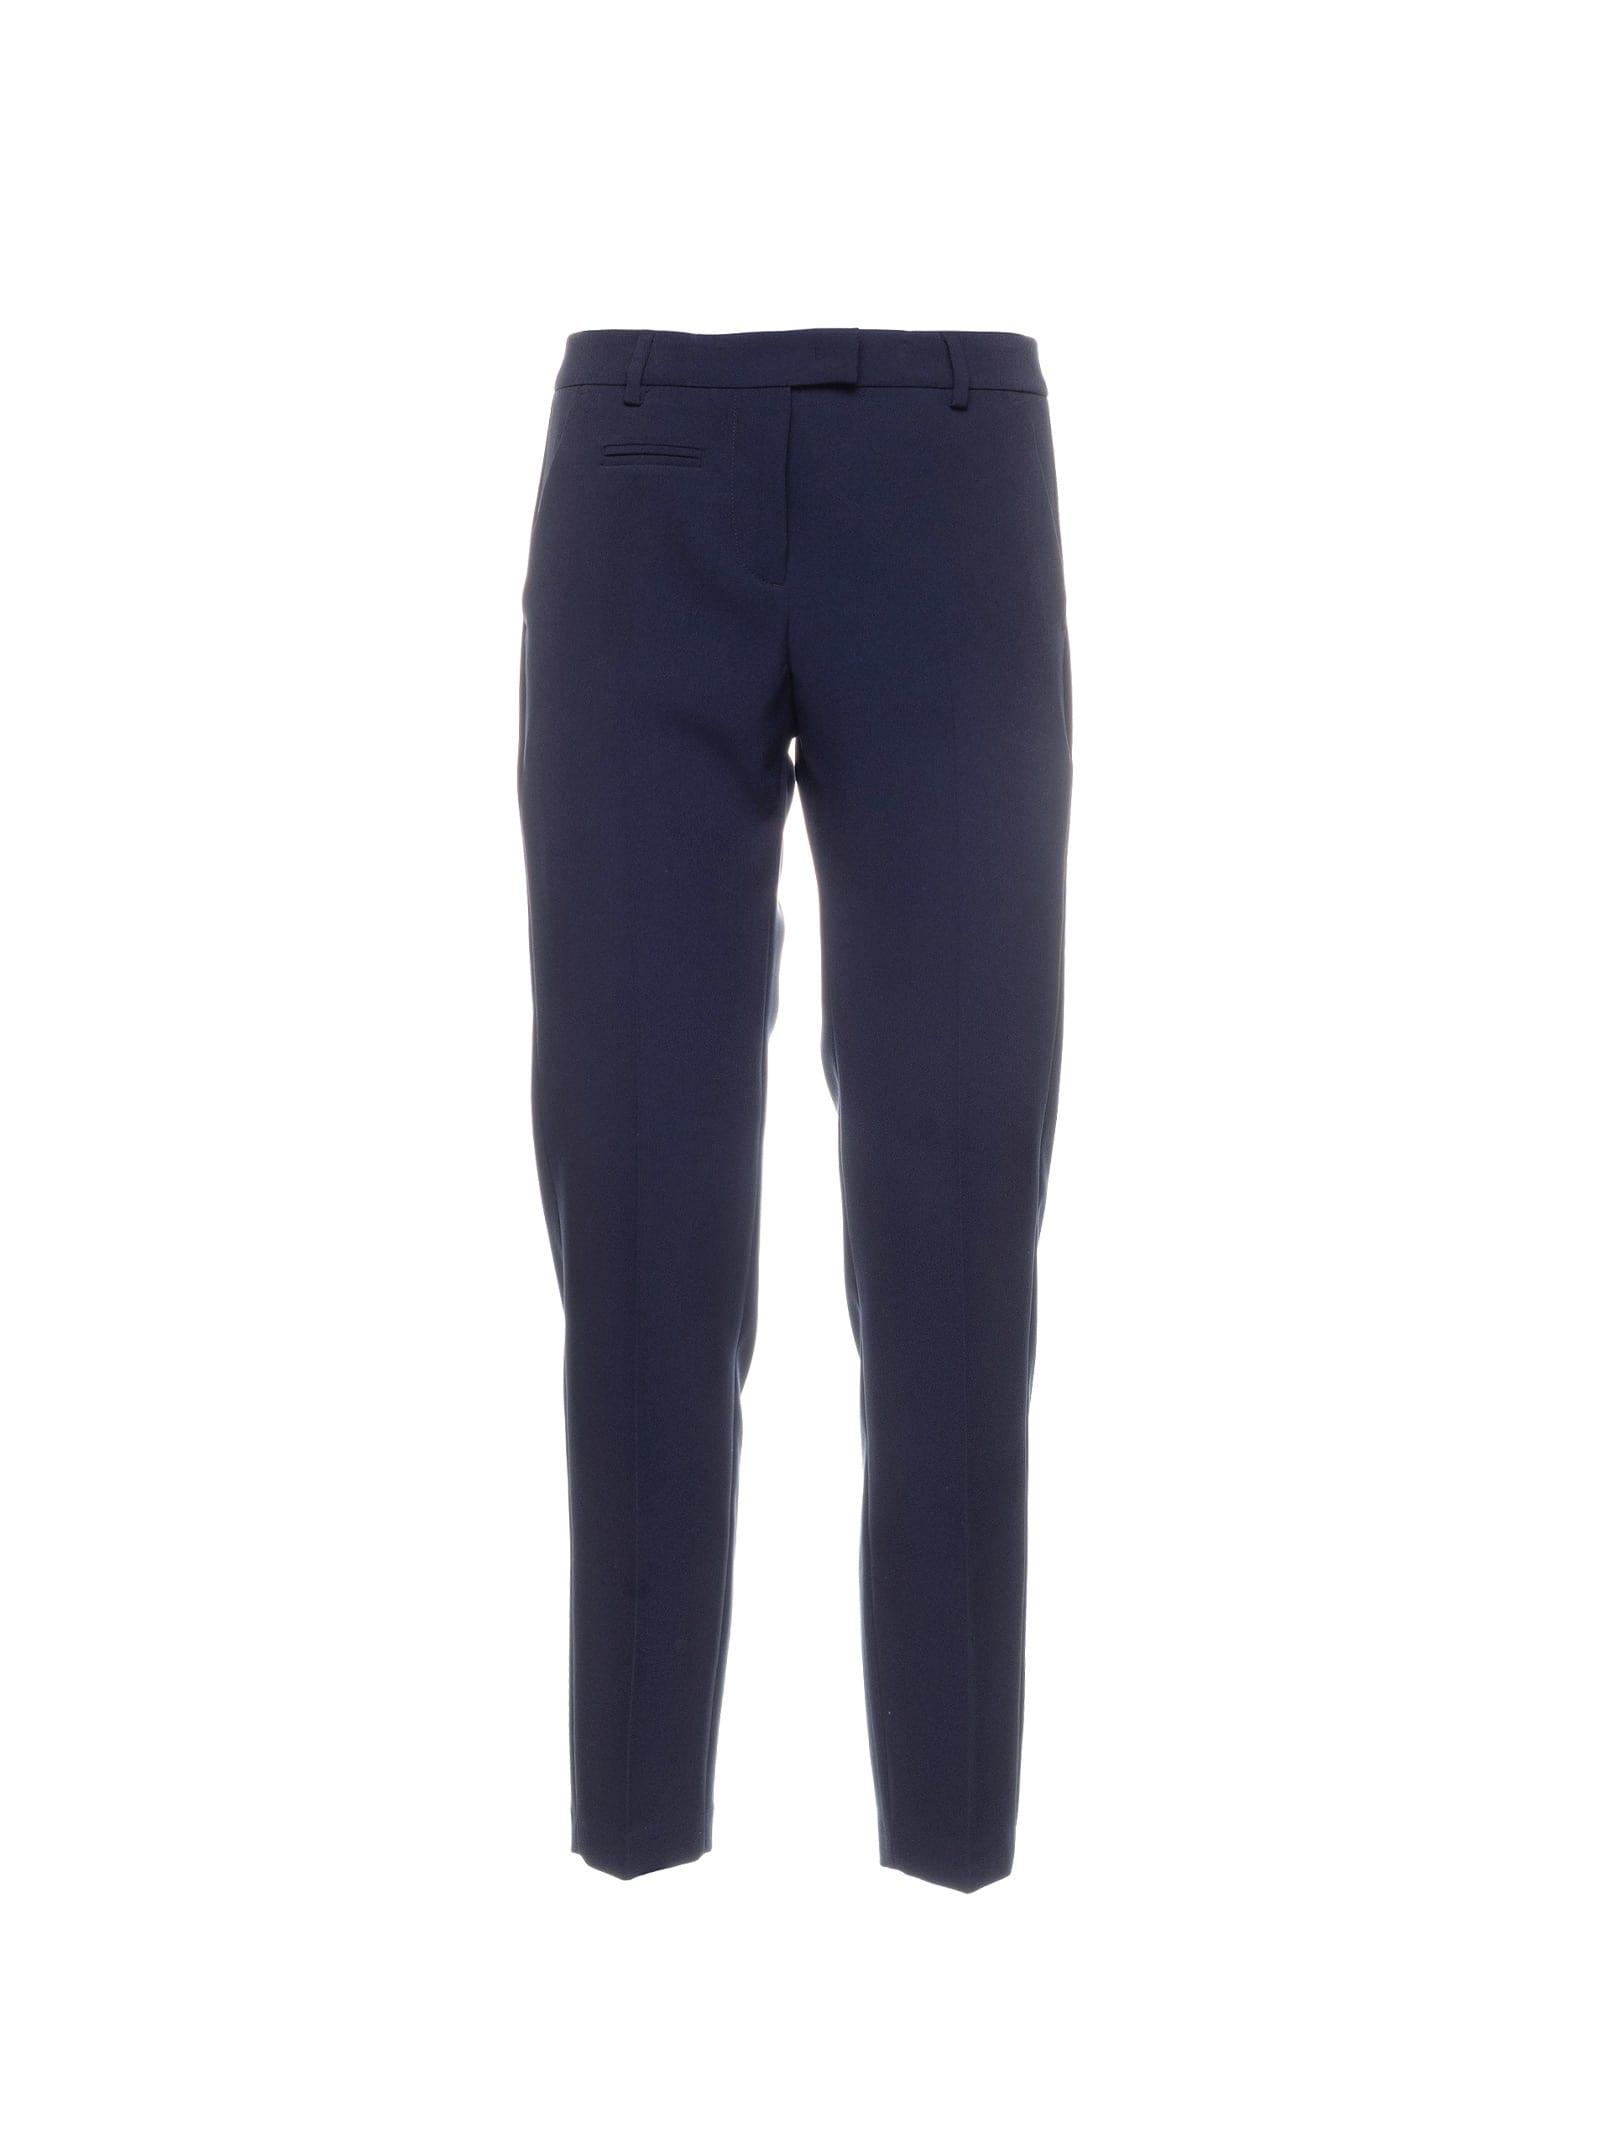 Seventy Seventy Blue Trousers